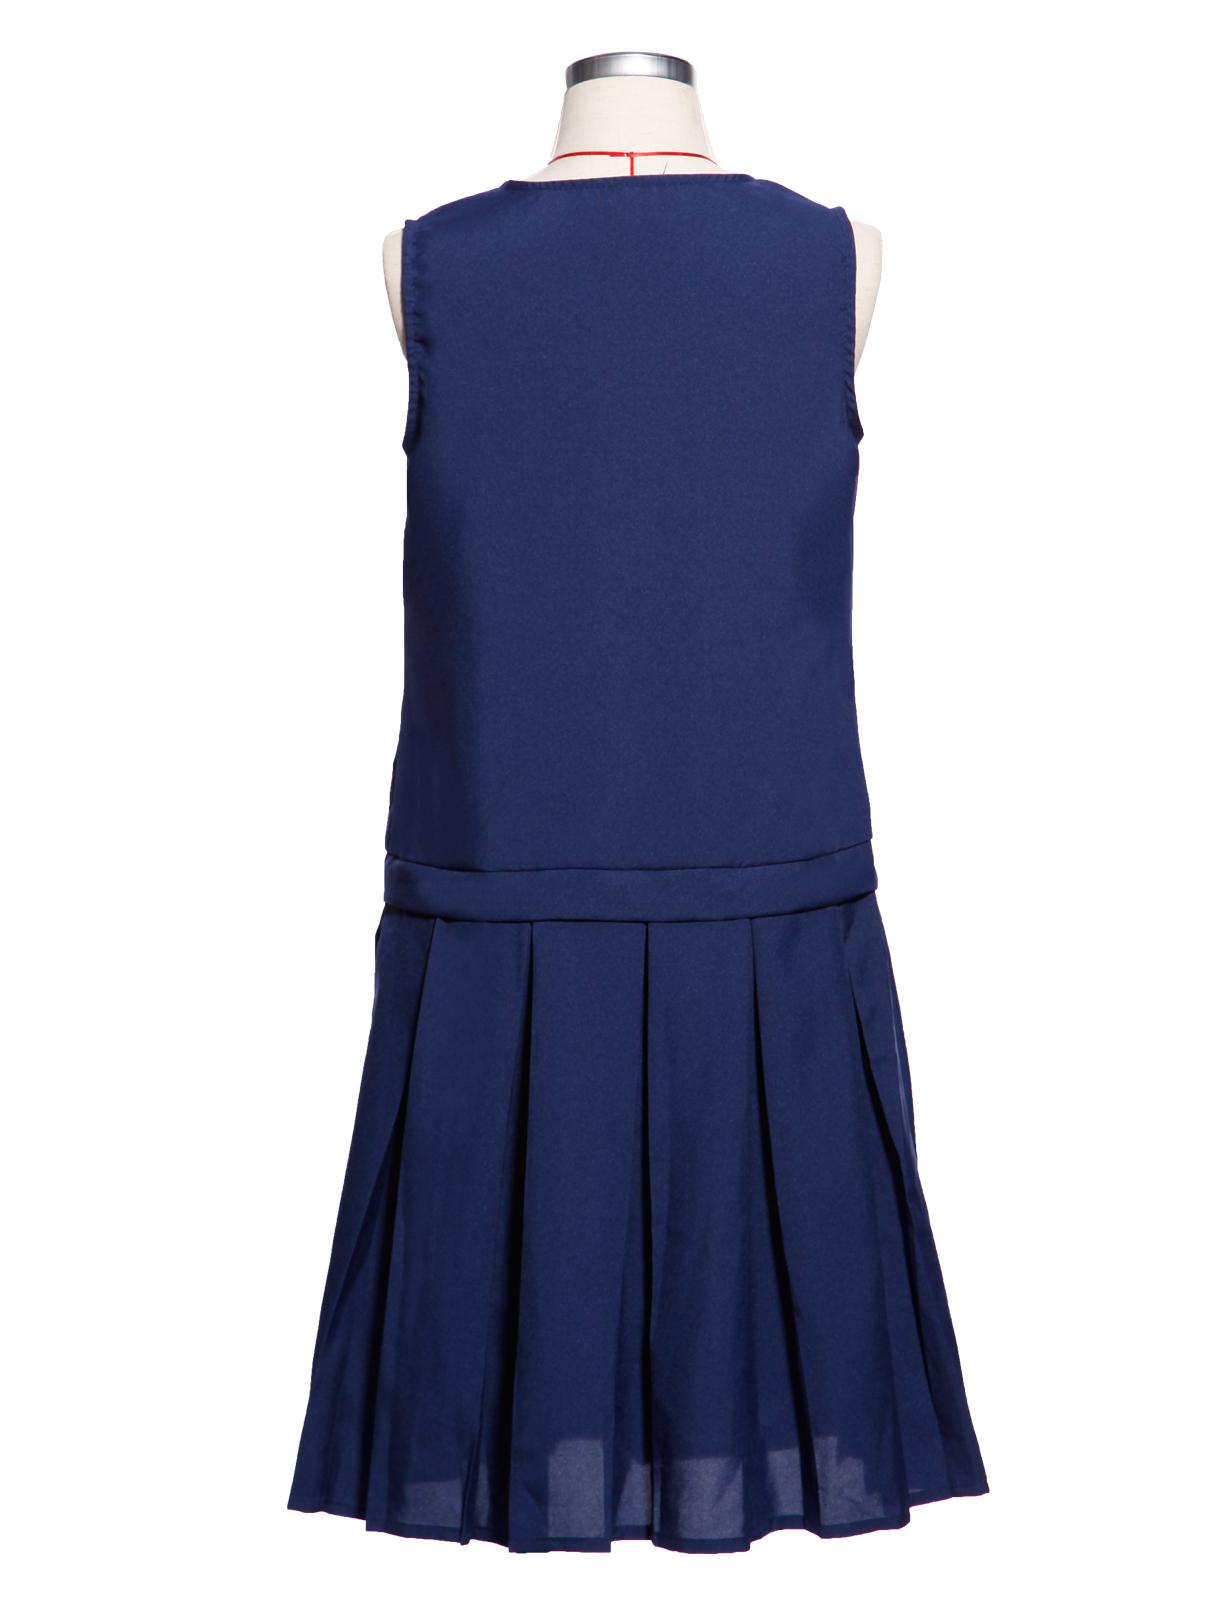 Girls School Uniform School Wear Sleeveless Zip Front